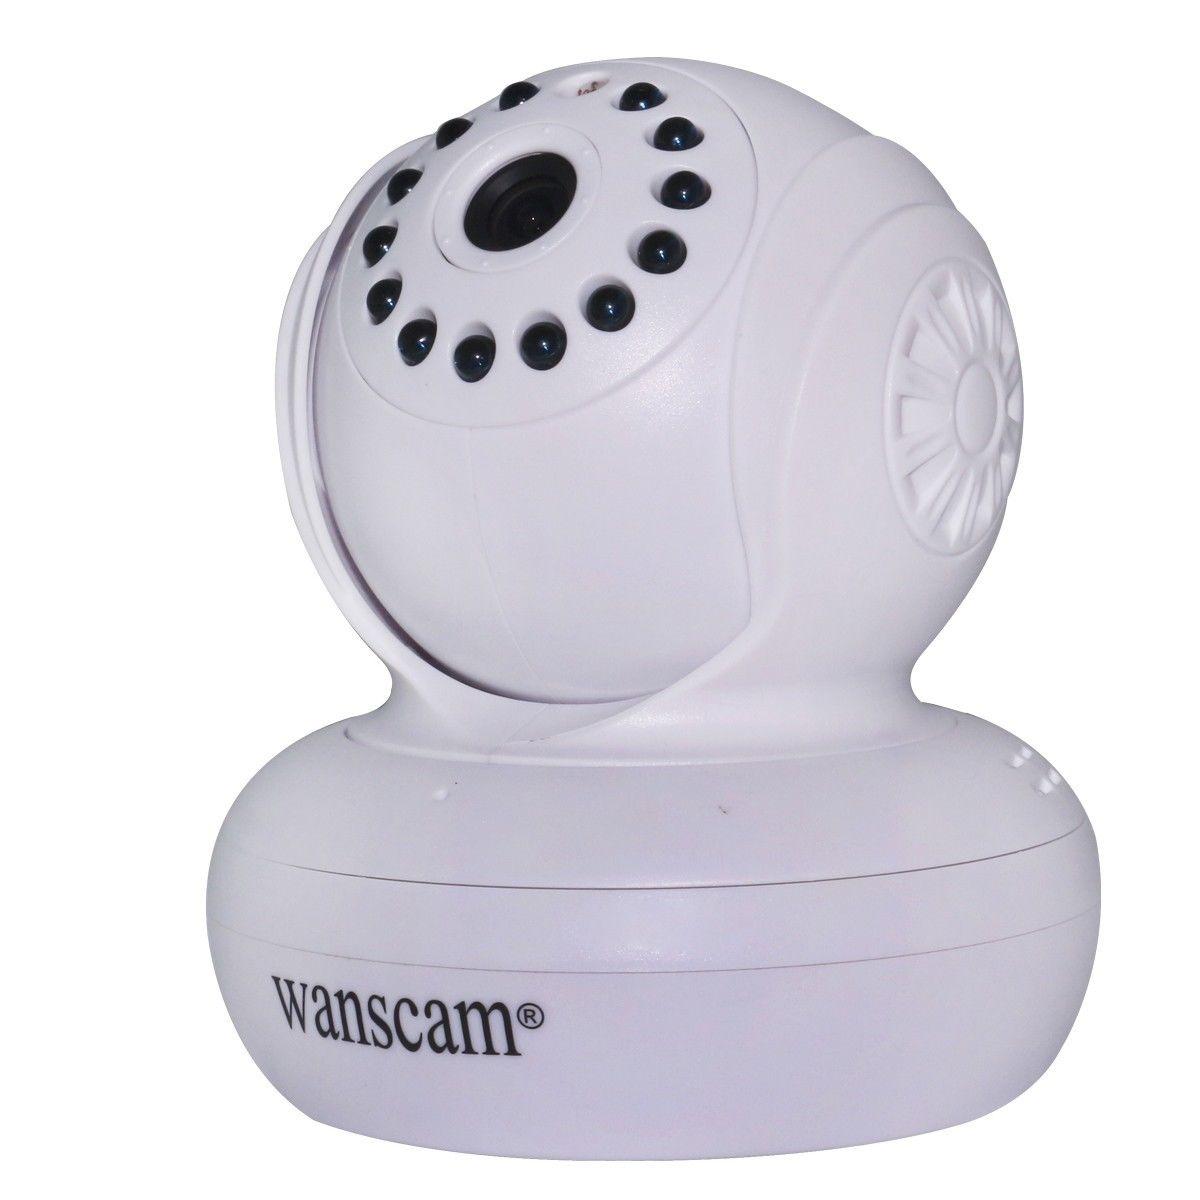 Видеокамера с записью на флеш-карту с записью и wi-fi. Стоит порядка $50 на ebay